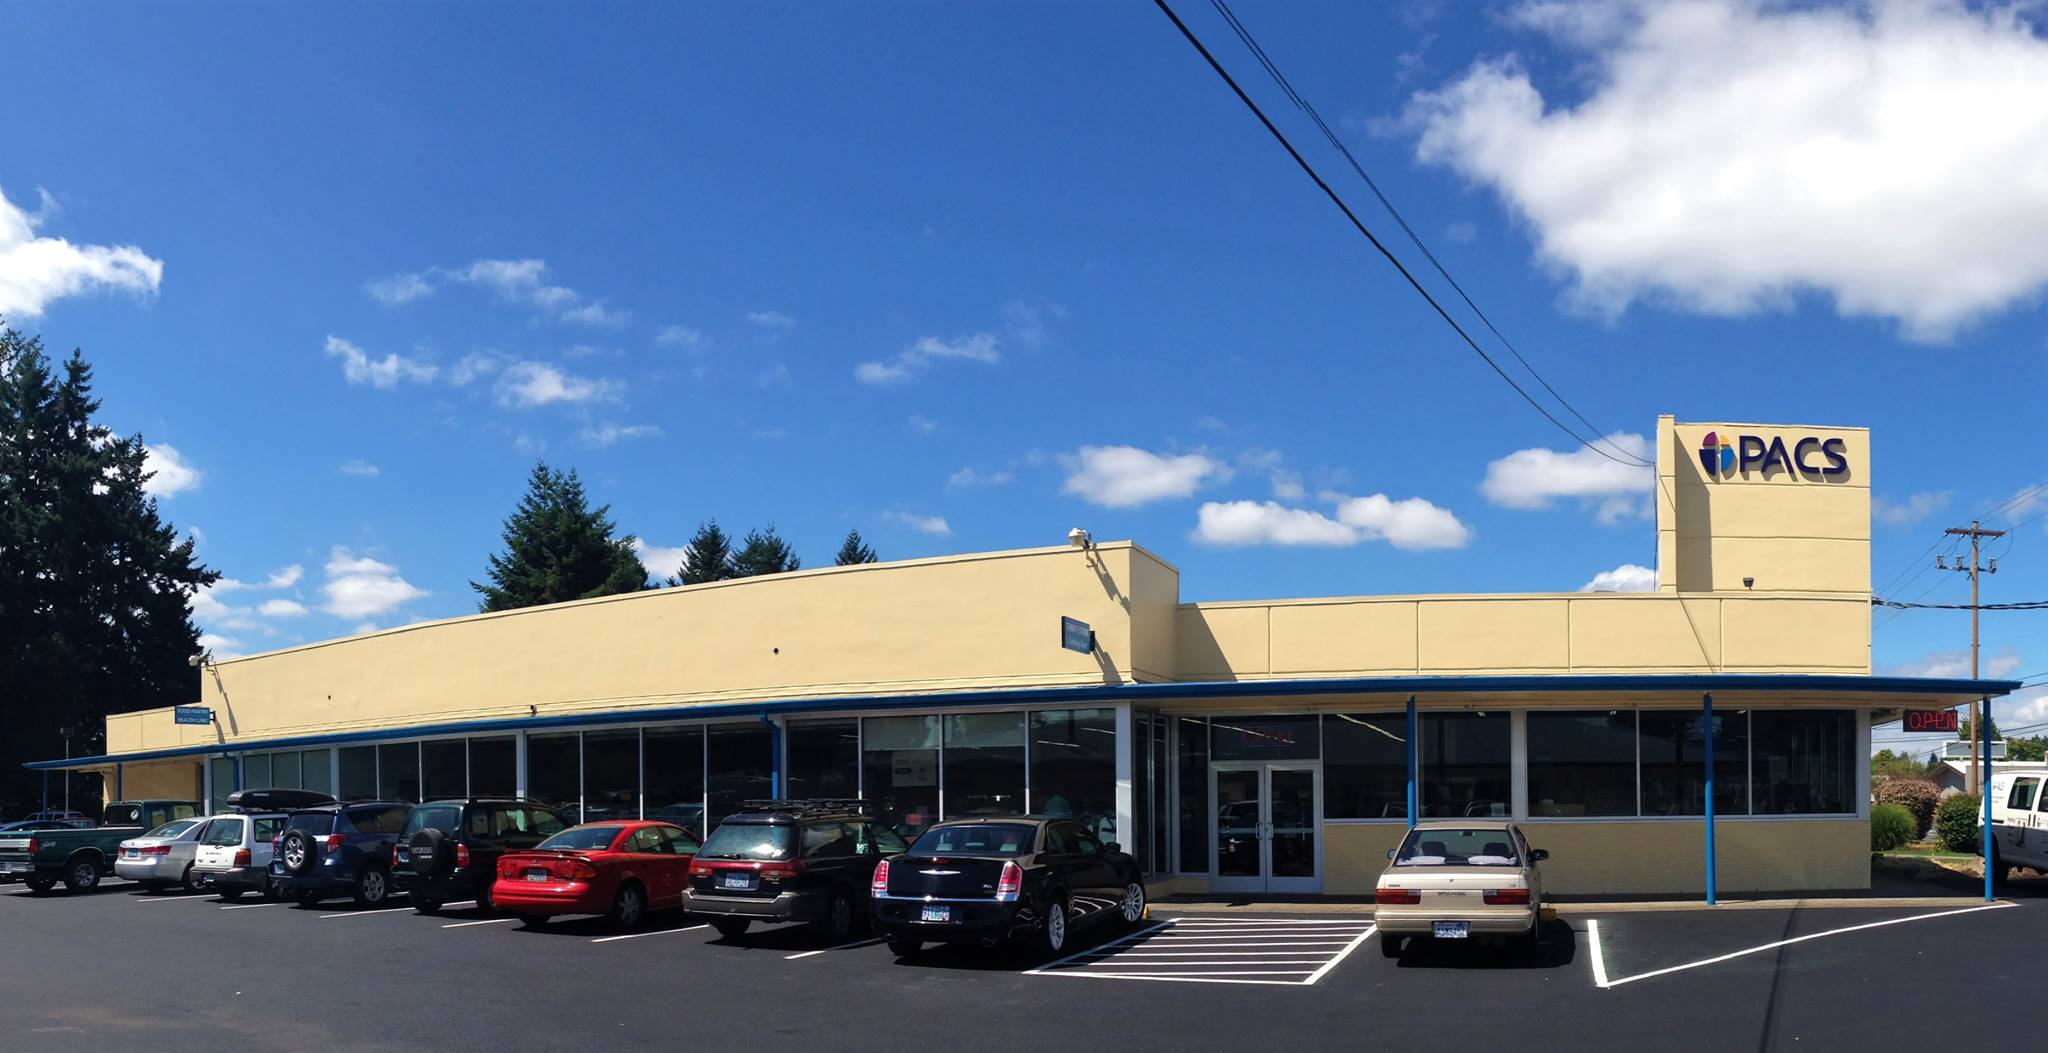 Portland Adventist Community Services